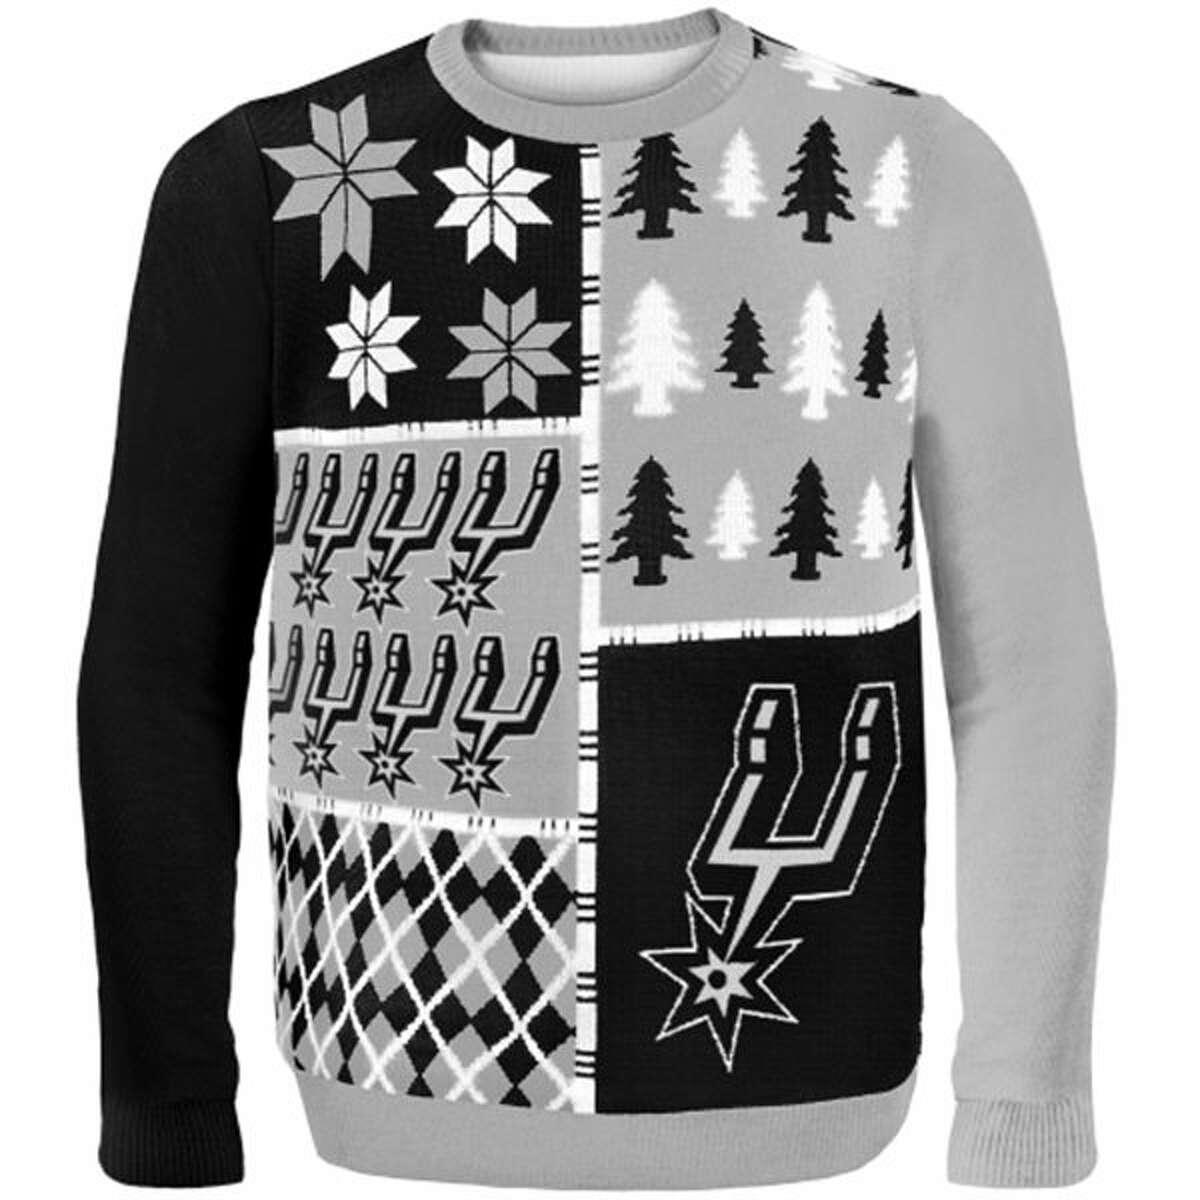 San Antonio Spurs ugly sweater